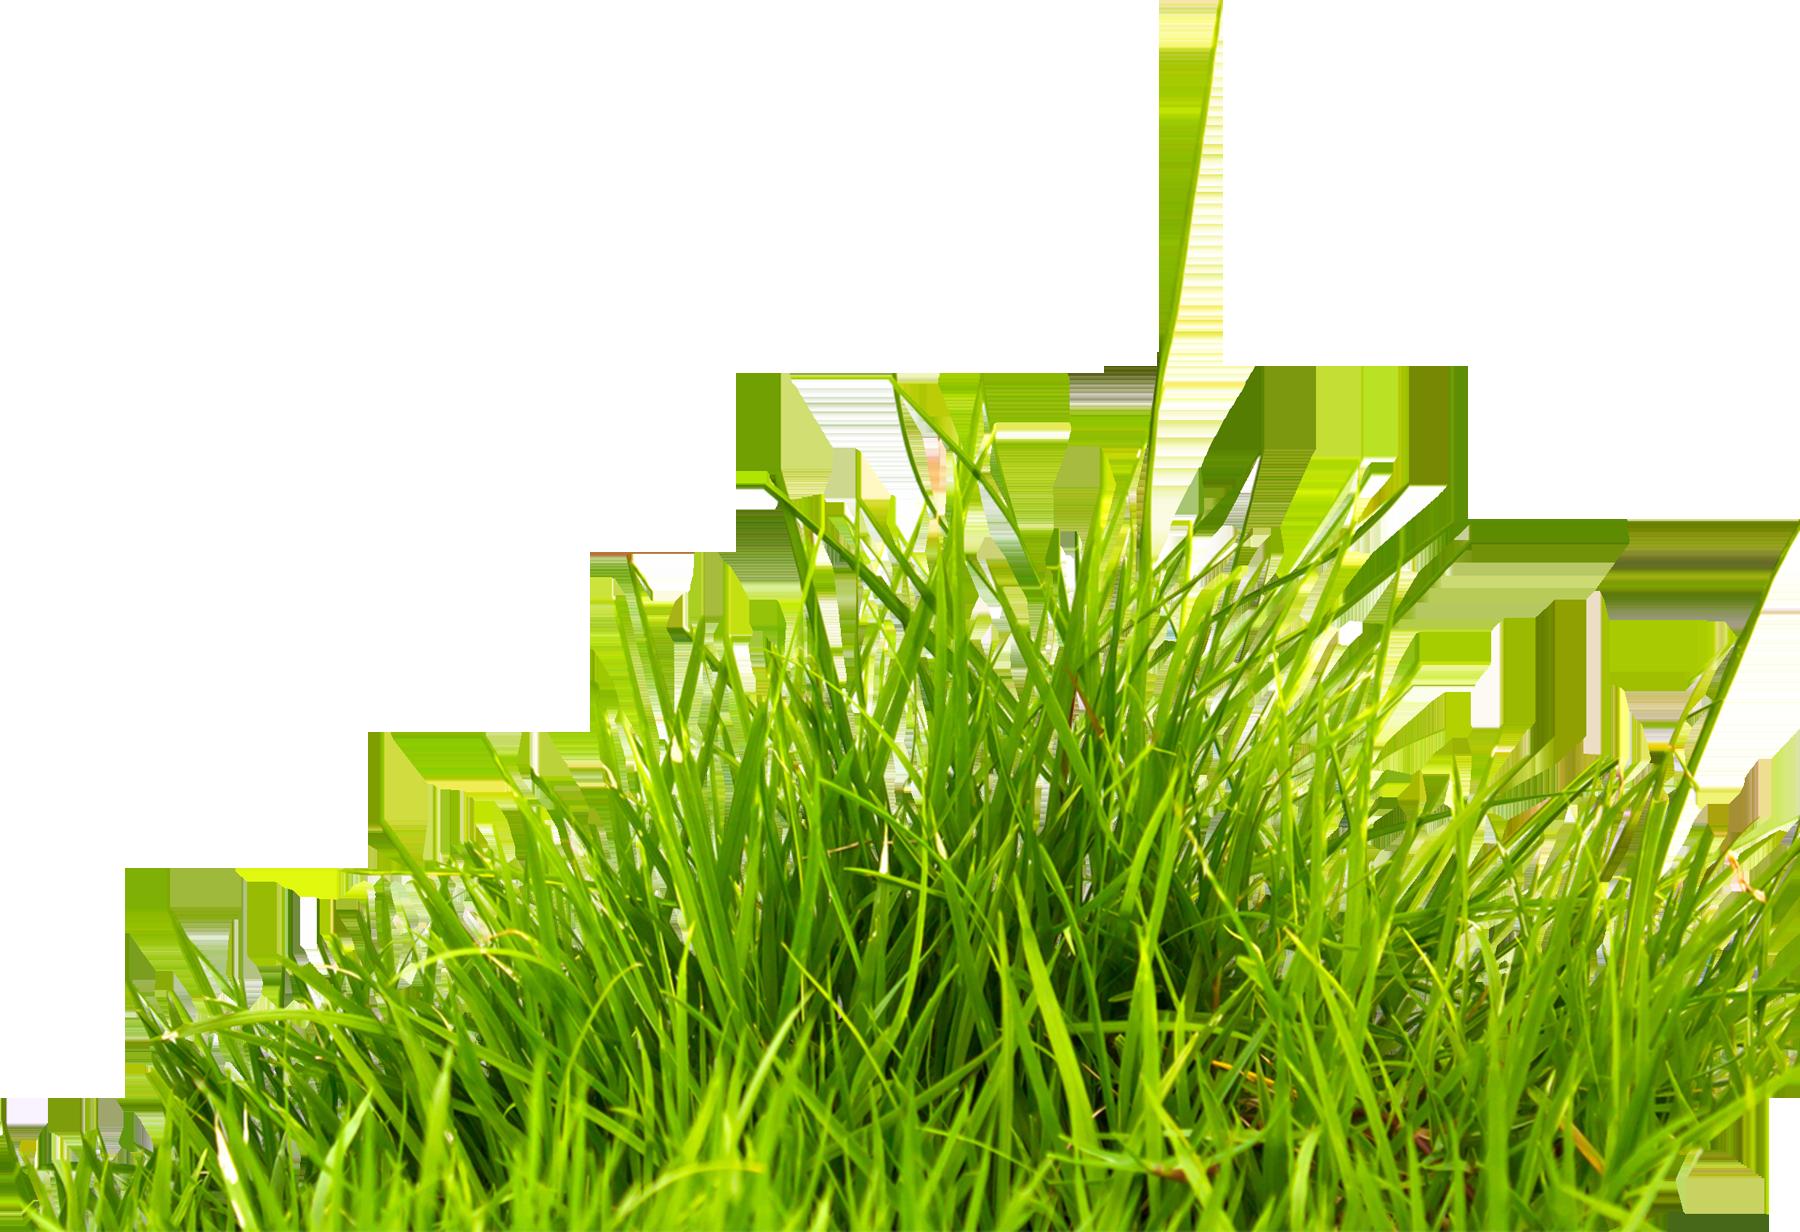 Grass Png Image Green Grass Png Picture Grass Photoshop Grass Picsart Png